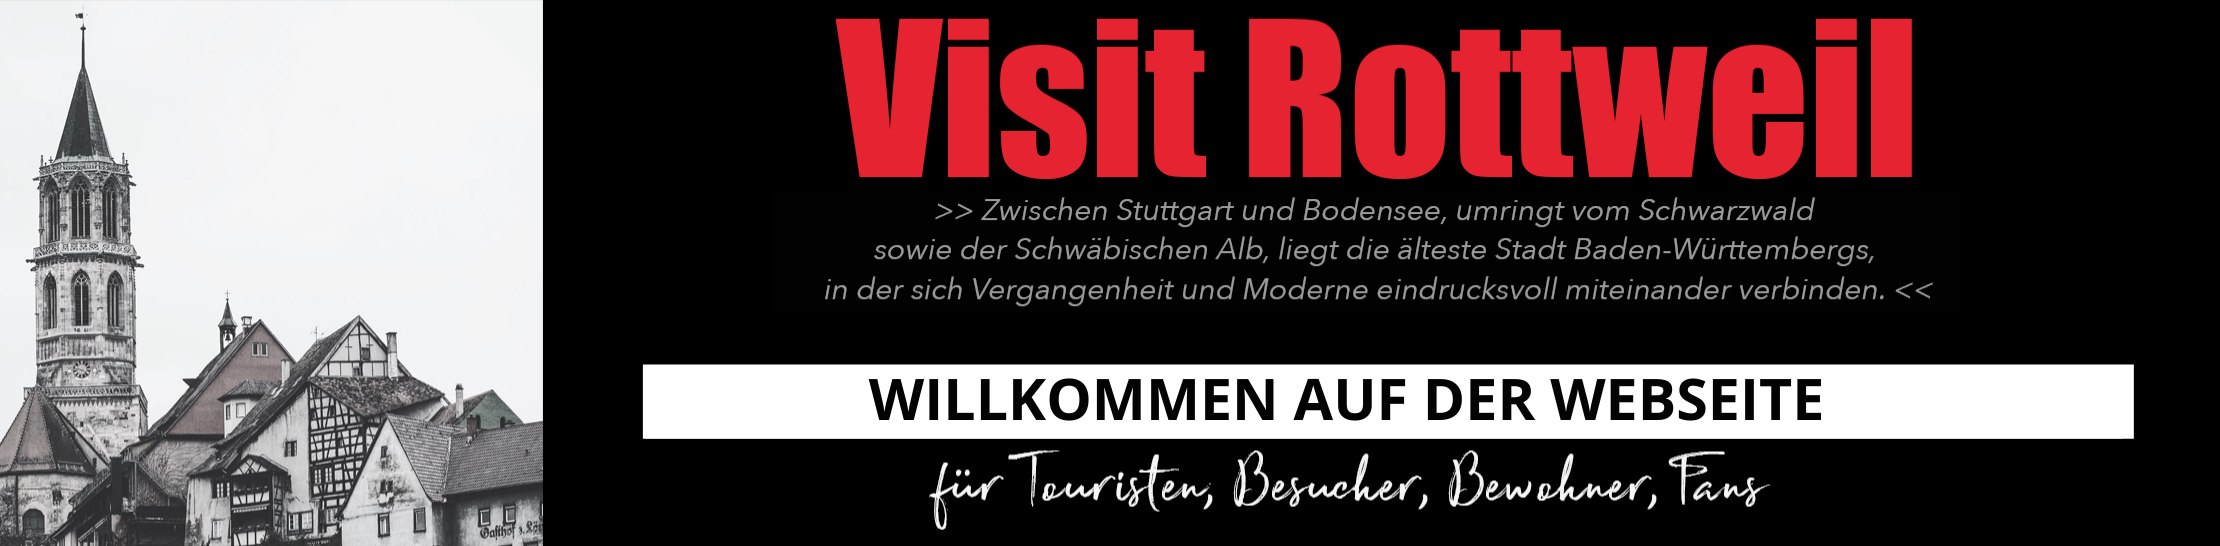 Visit Rottweil